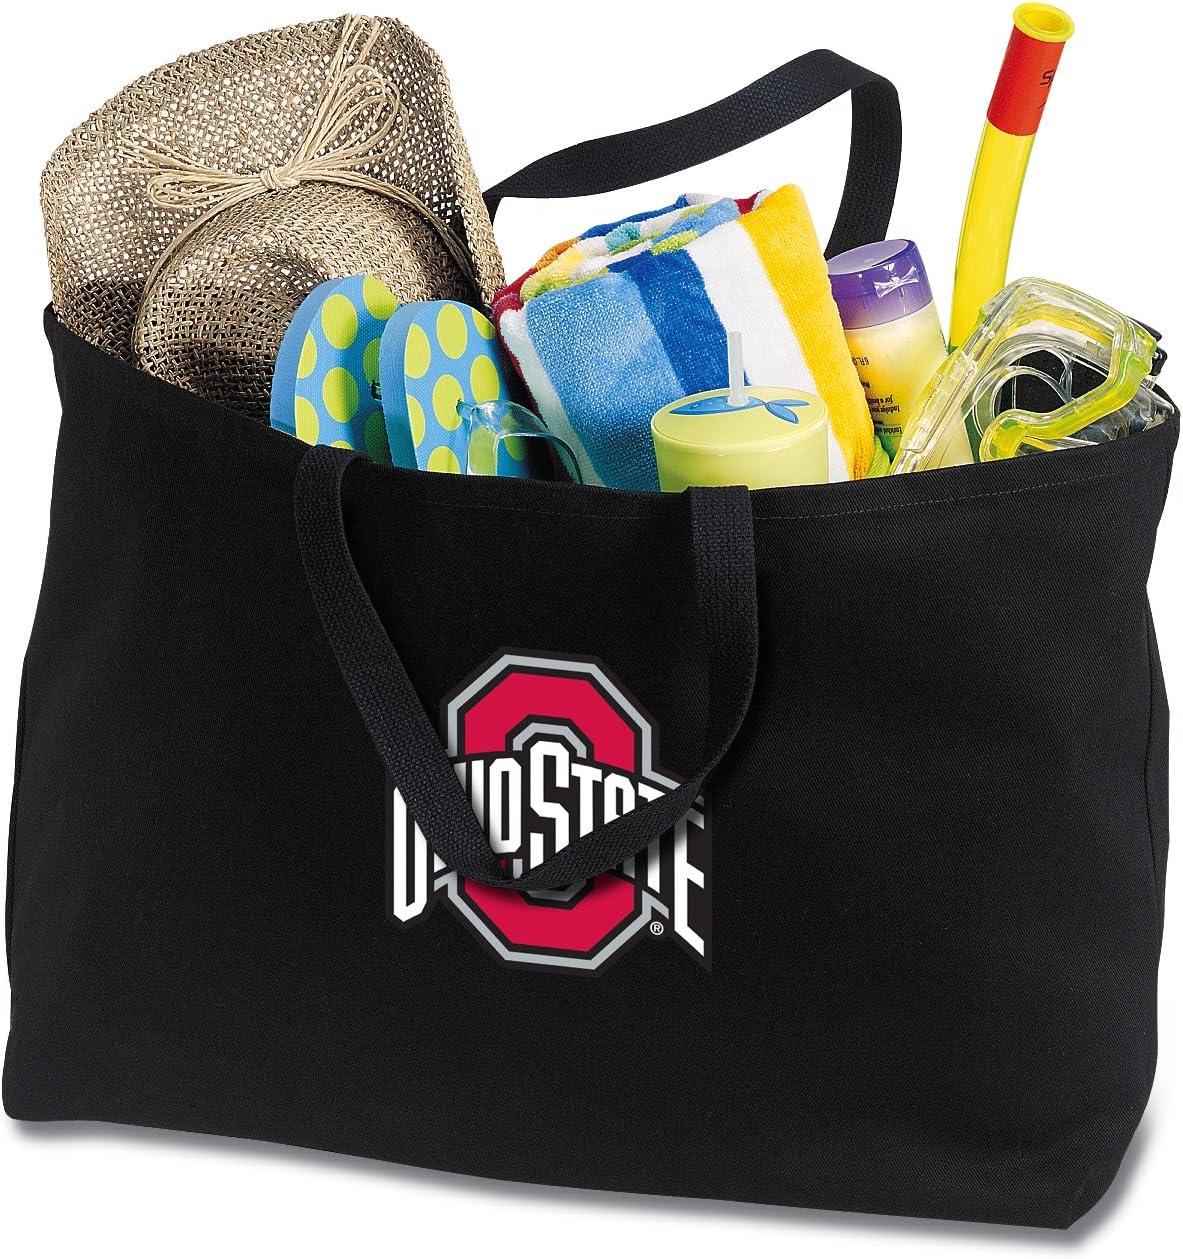 Broad Bay Jumbo OSU Buckeyes Tote Bag or Large Canvas Ohio State University Shopping Bag